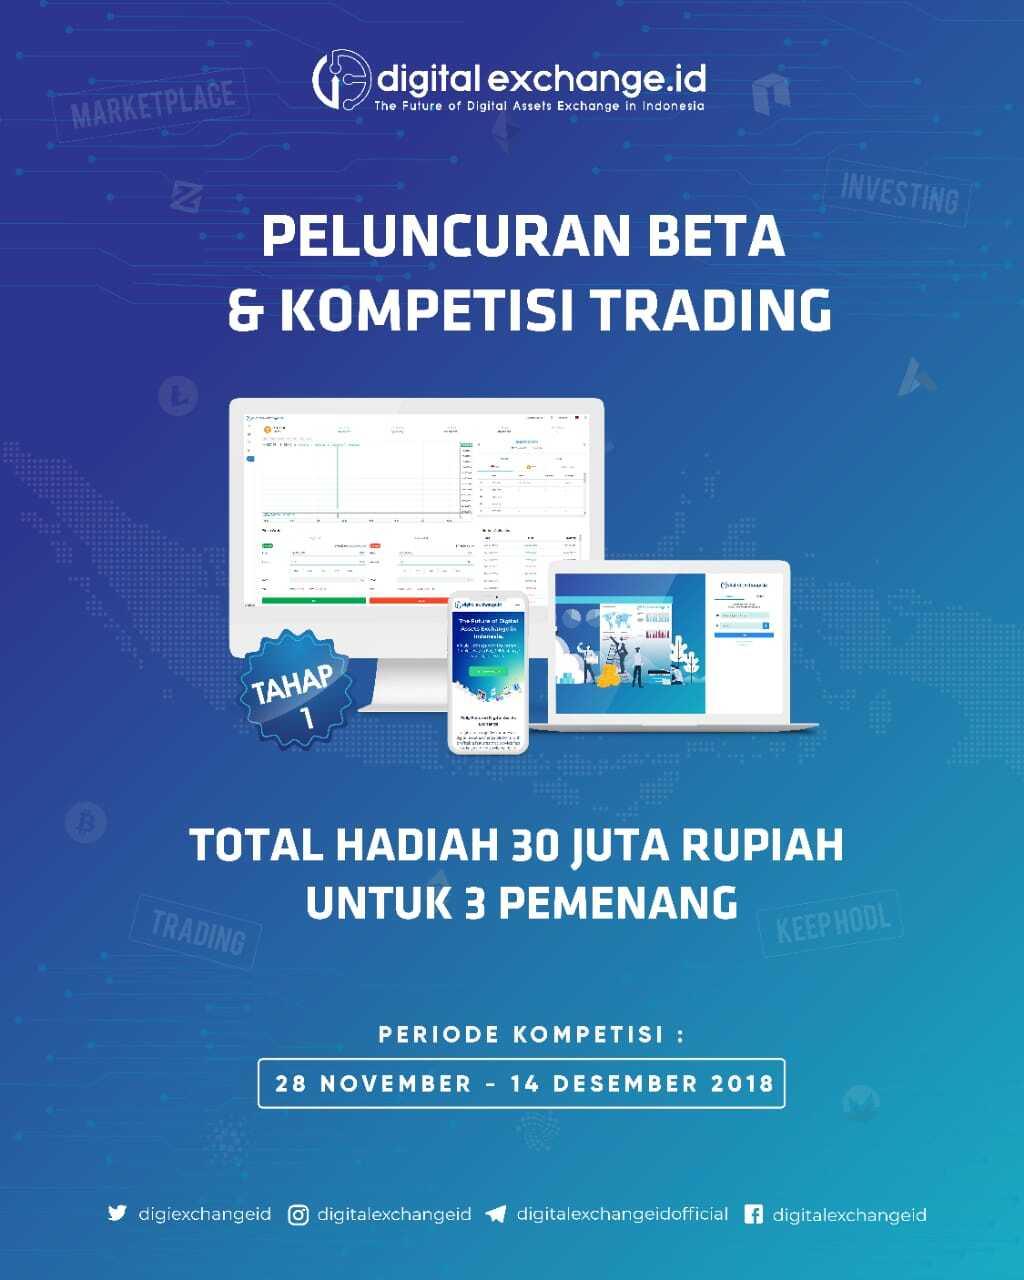 Peluncuran Beta Tahap 1 & Kompetisi Trading digitalexchange.id